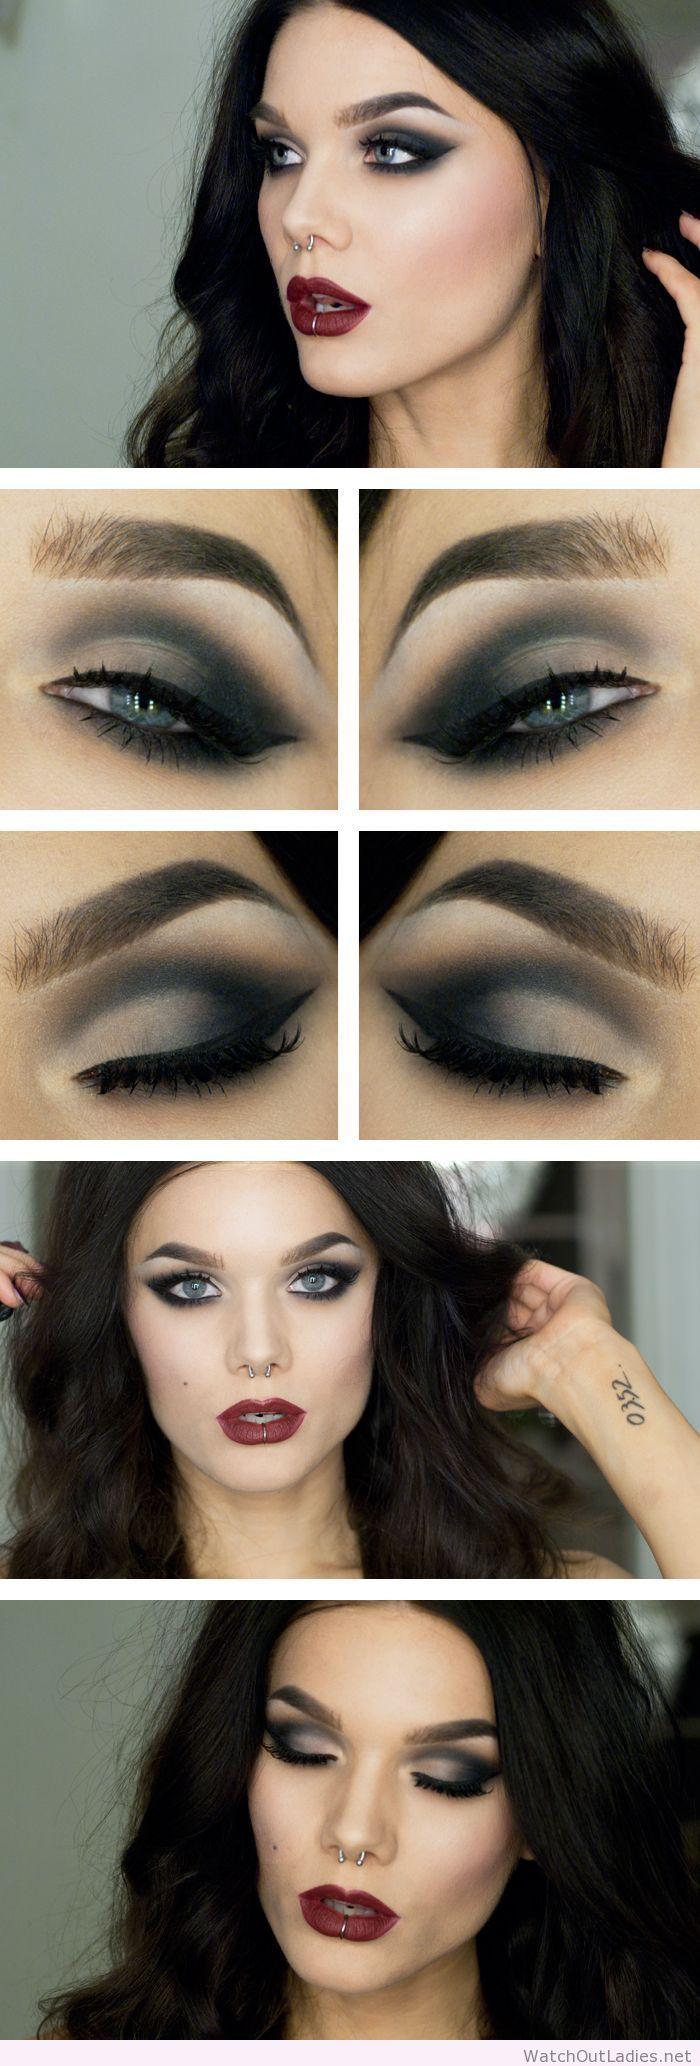 Linda Hallberg dark lips and eye makeup